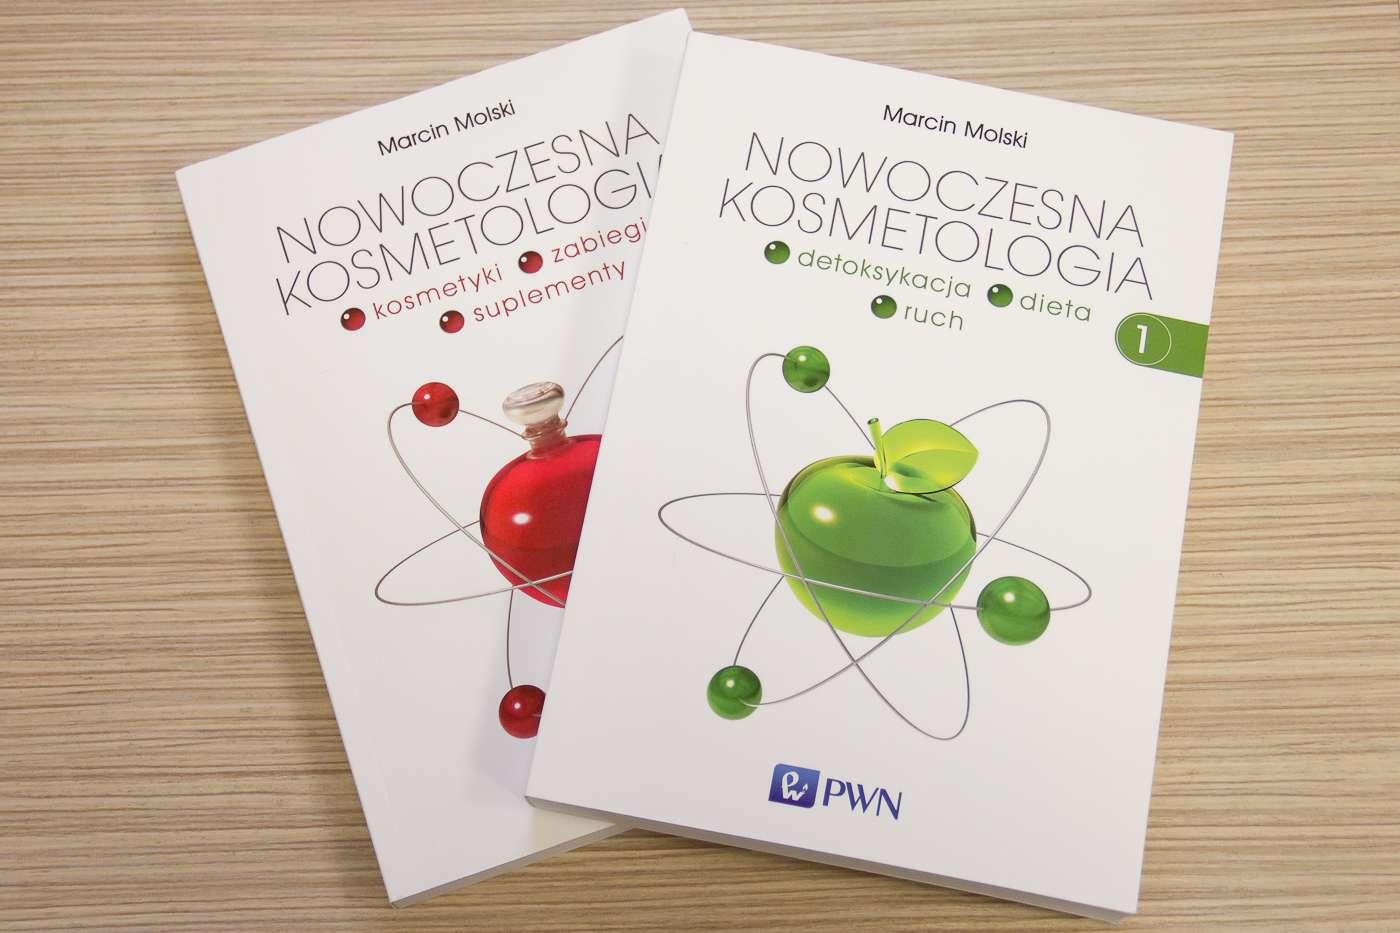 Marcin Molski: Nowoczesna kosmetologia